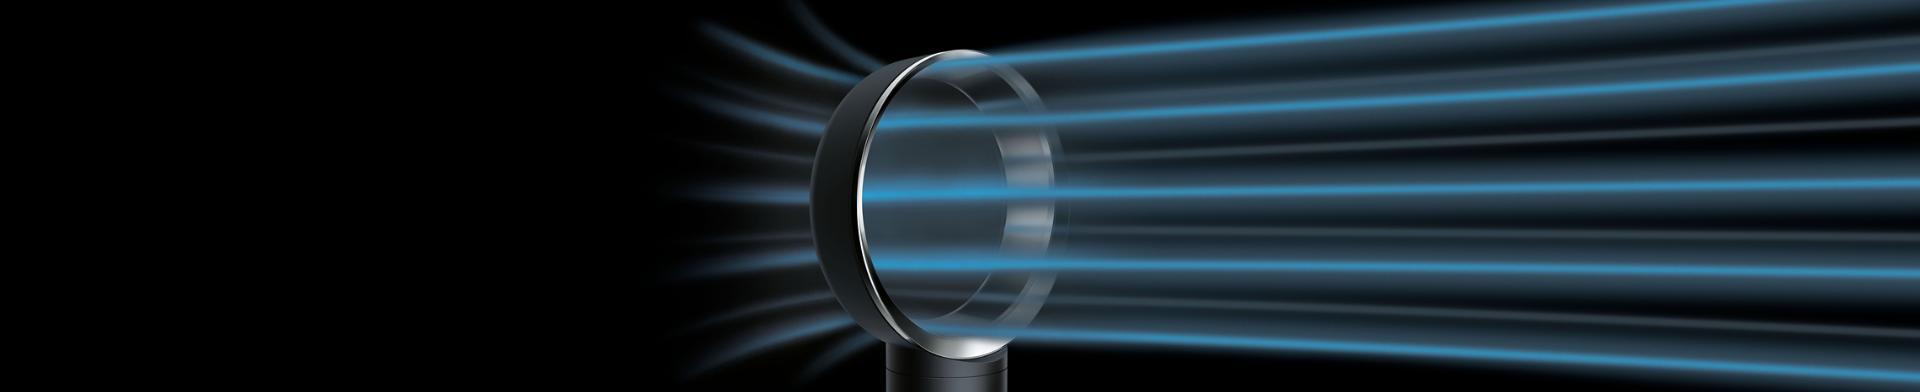 Dyson風扇和氣流的近鏡